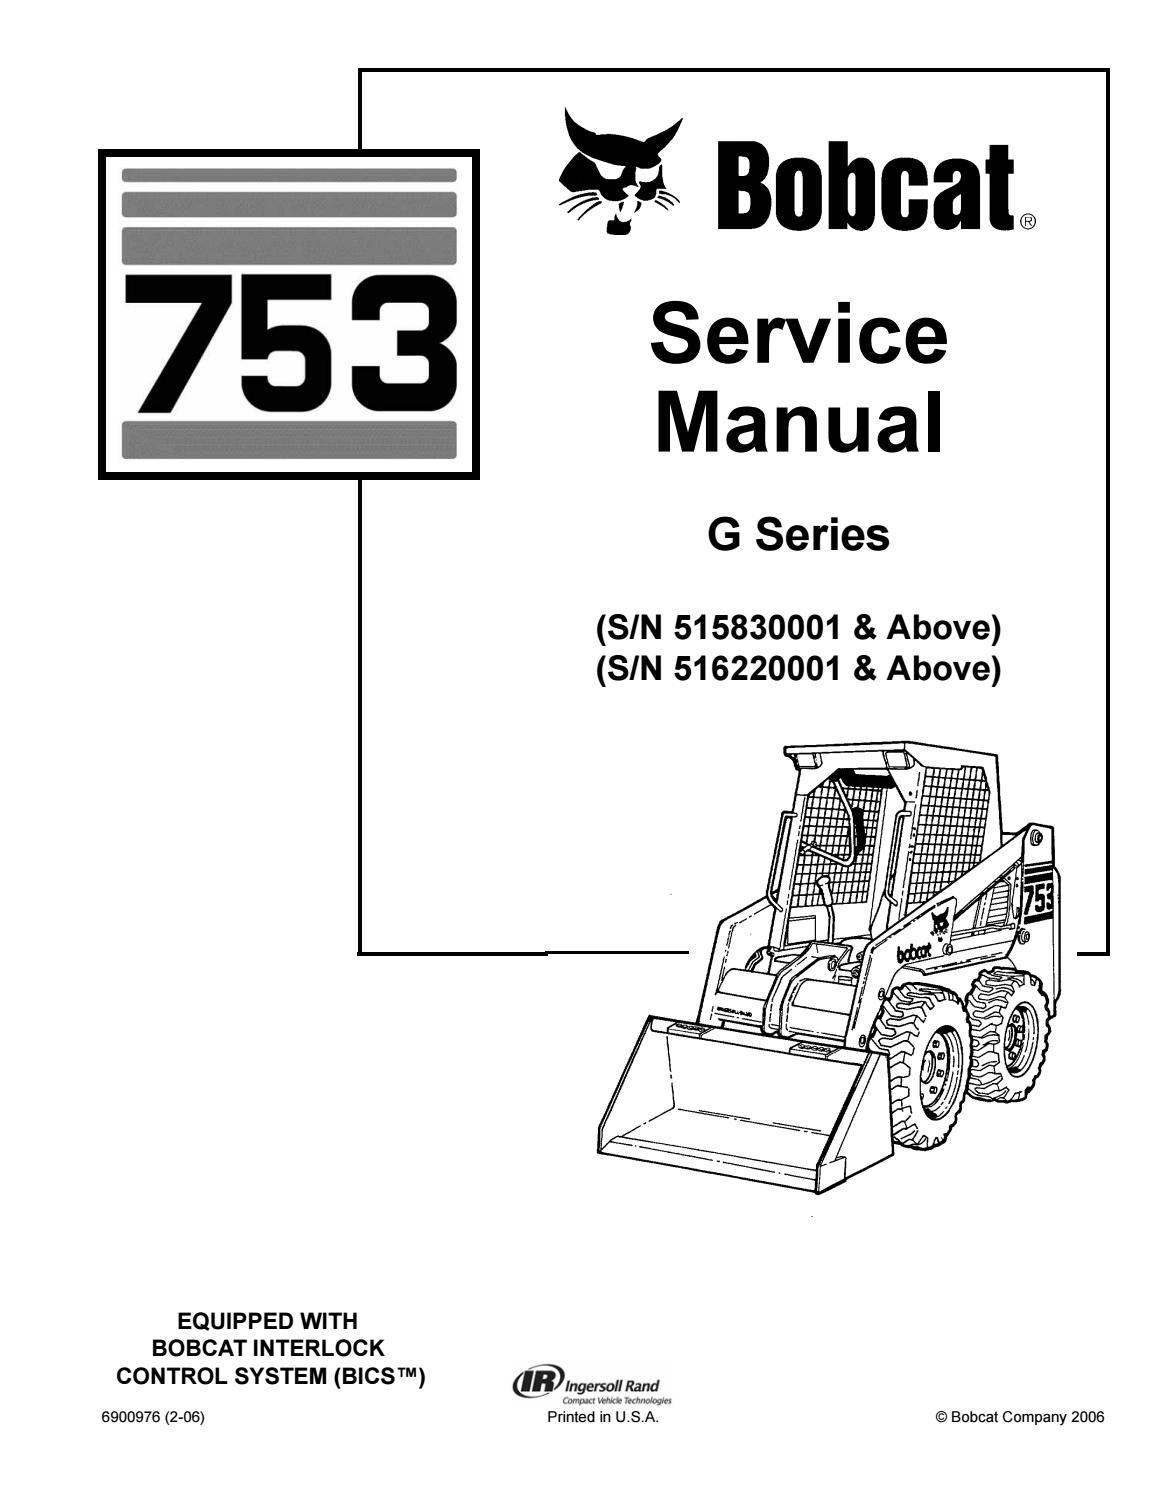 hight resolution of bobcat 753 skid steer loader service repair manual sn 515830001 above sn 516220001 above by ujfjisefjj issuu